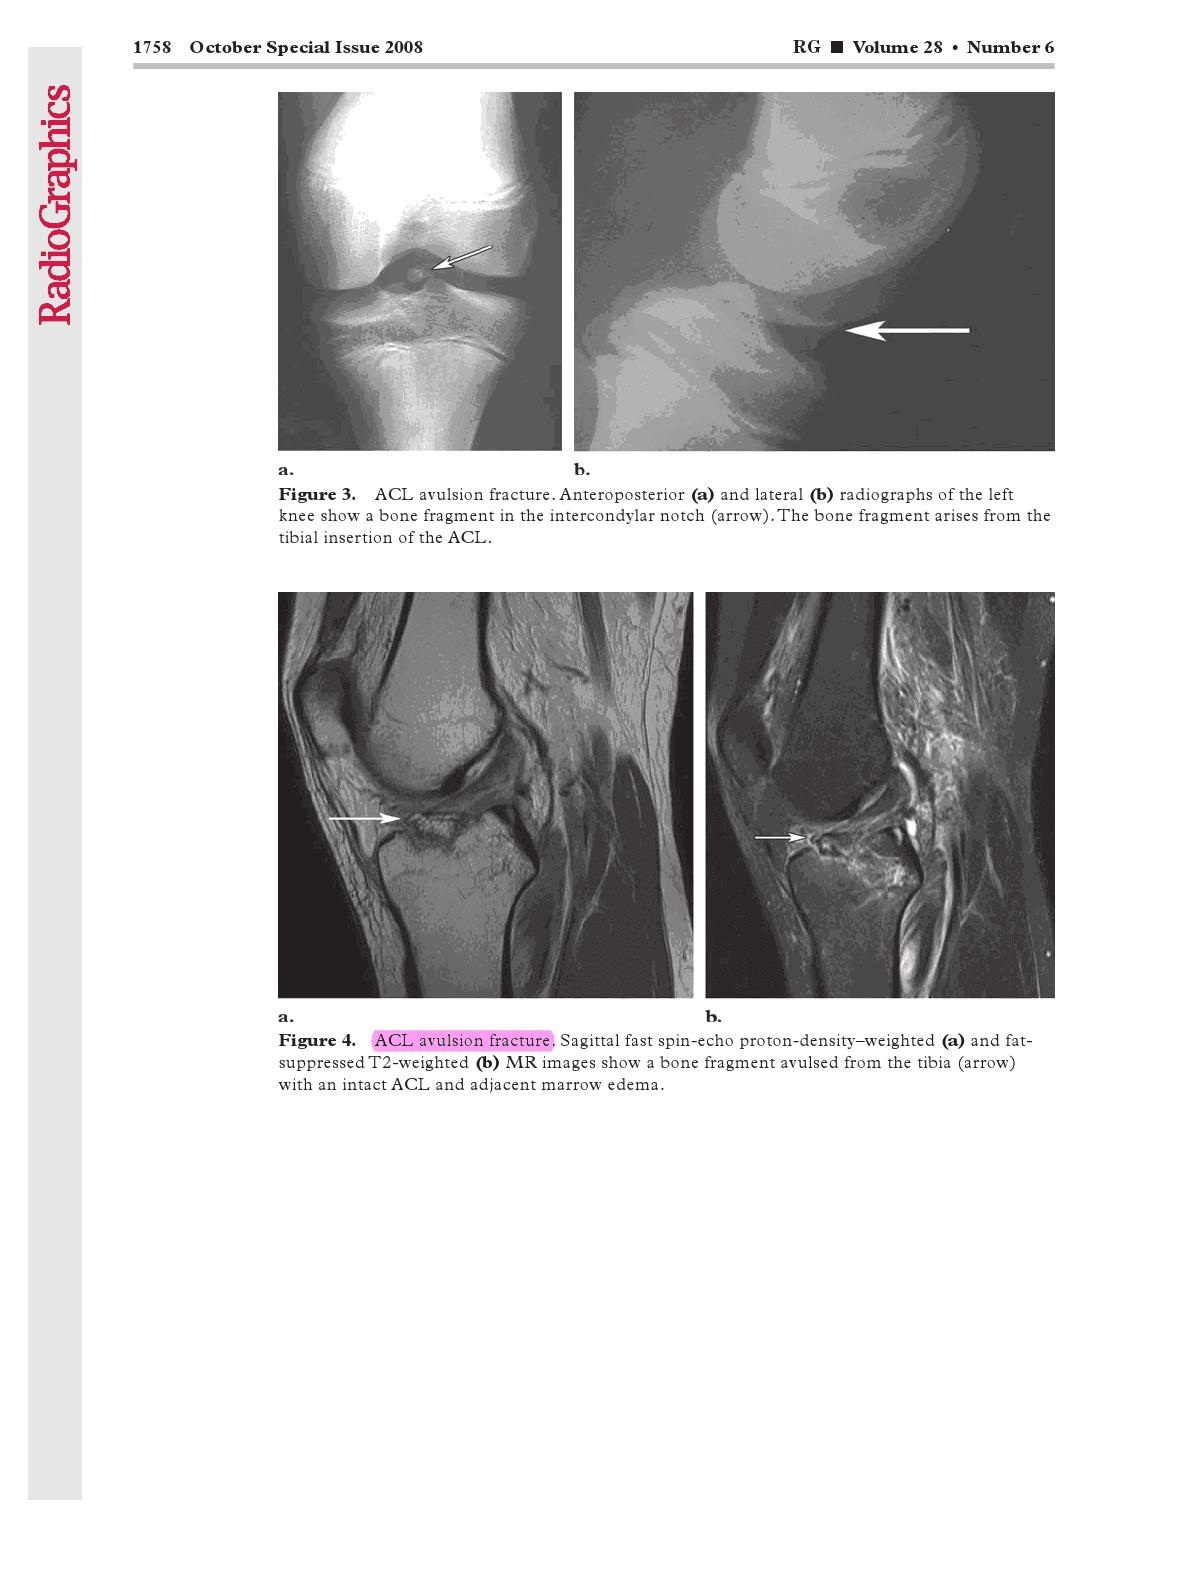 Knee avulsion fracture, RG, ACL, PCL, patellar tendon-4.bp.blogspot.com